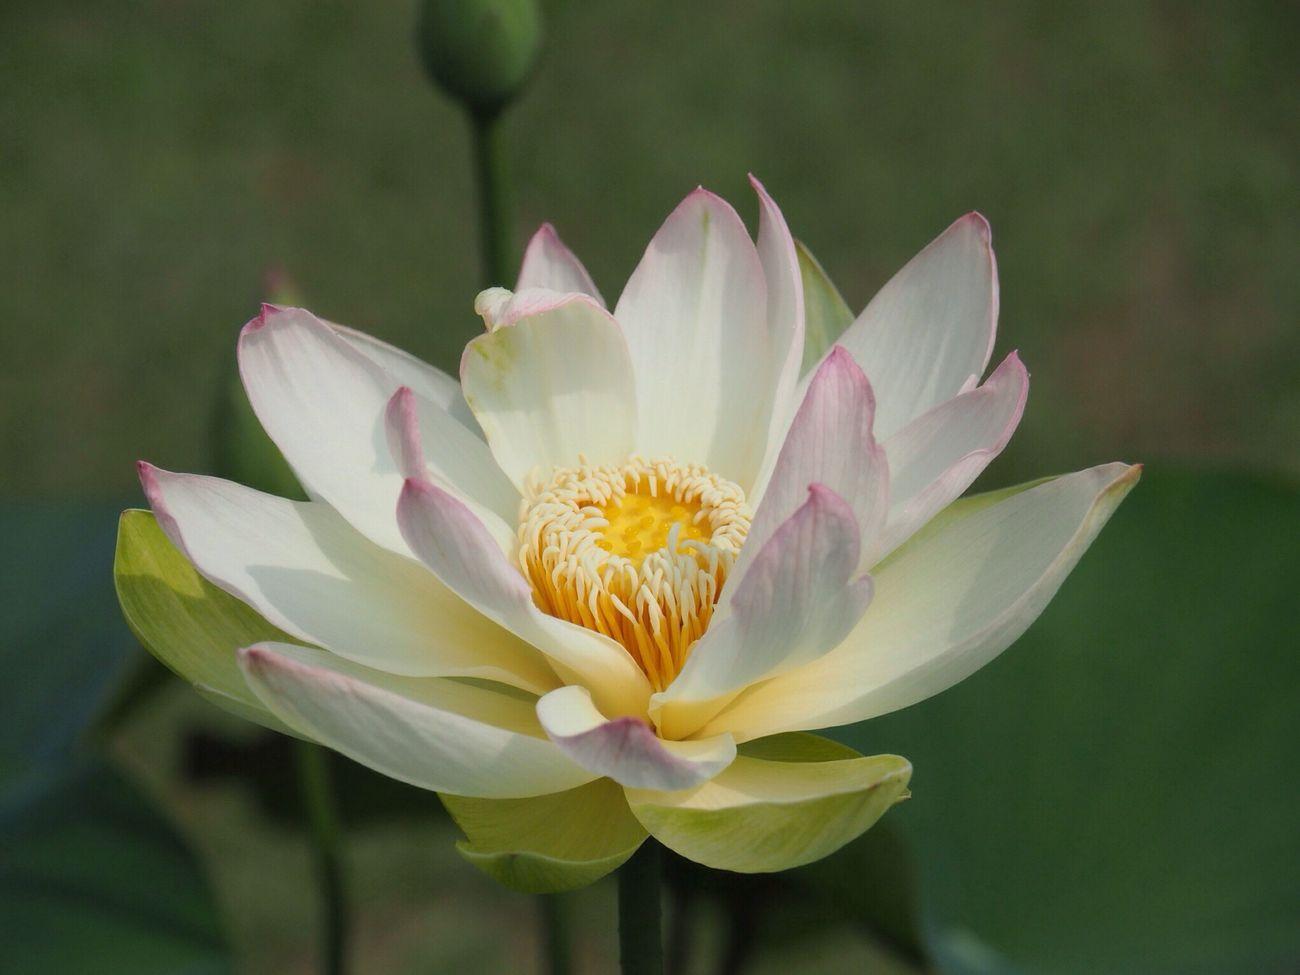 Kyoto Japan Uji Mimurotoji Temple Shrine Lotus Flower Petal Beauty In Nature Nature Growth Close-up Plant Outdoors Day No People Olympus PEN-F 京都 日本 宇治 三室戸寺 蓮 咲き始め